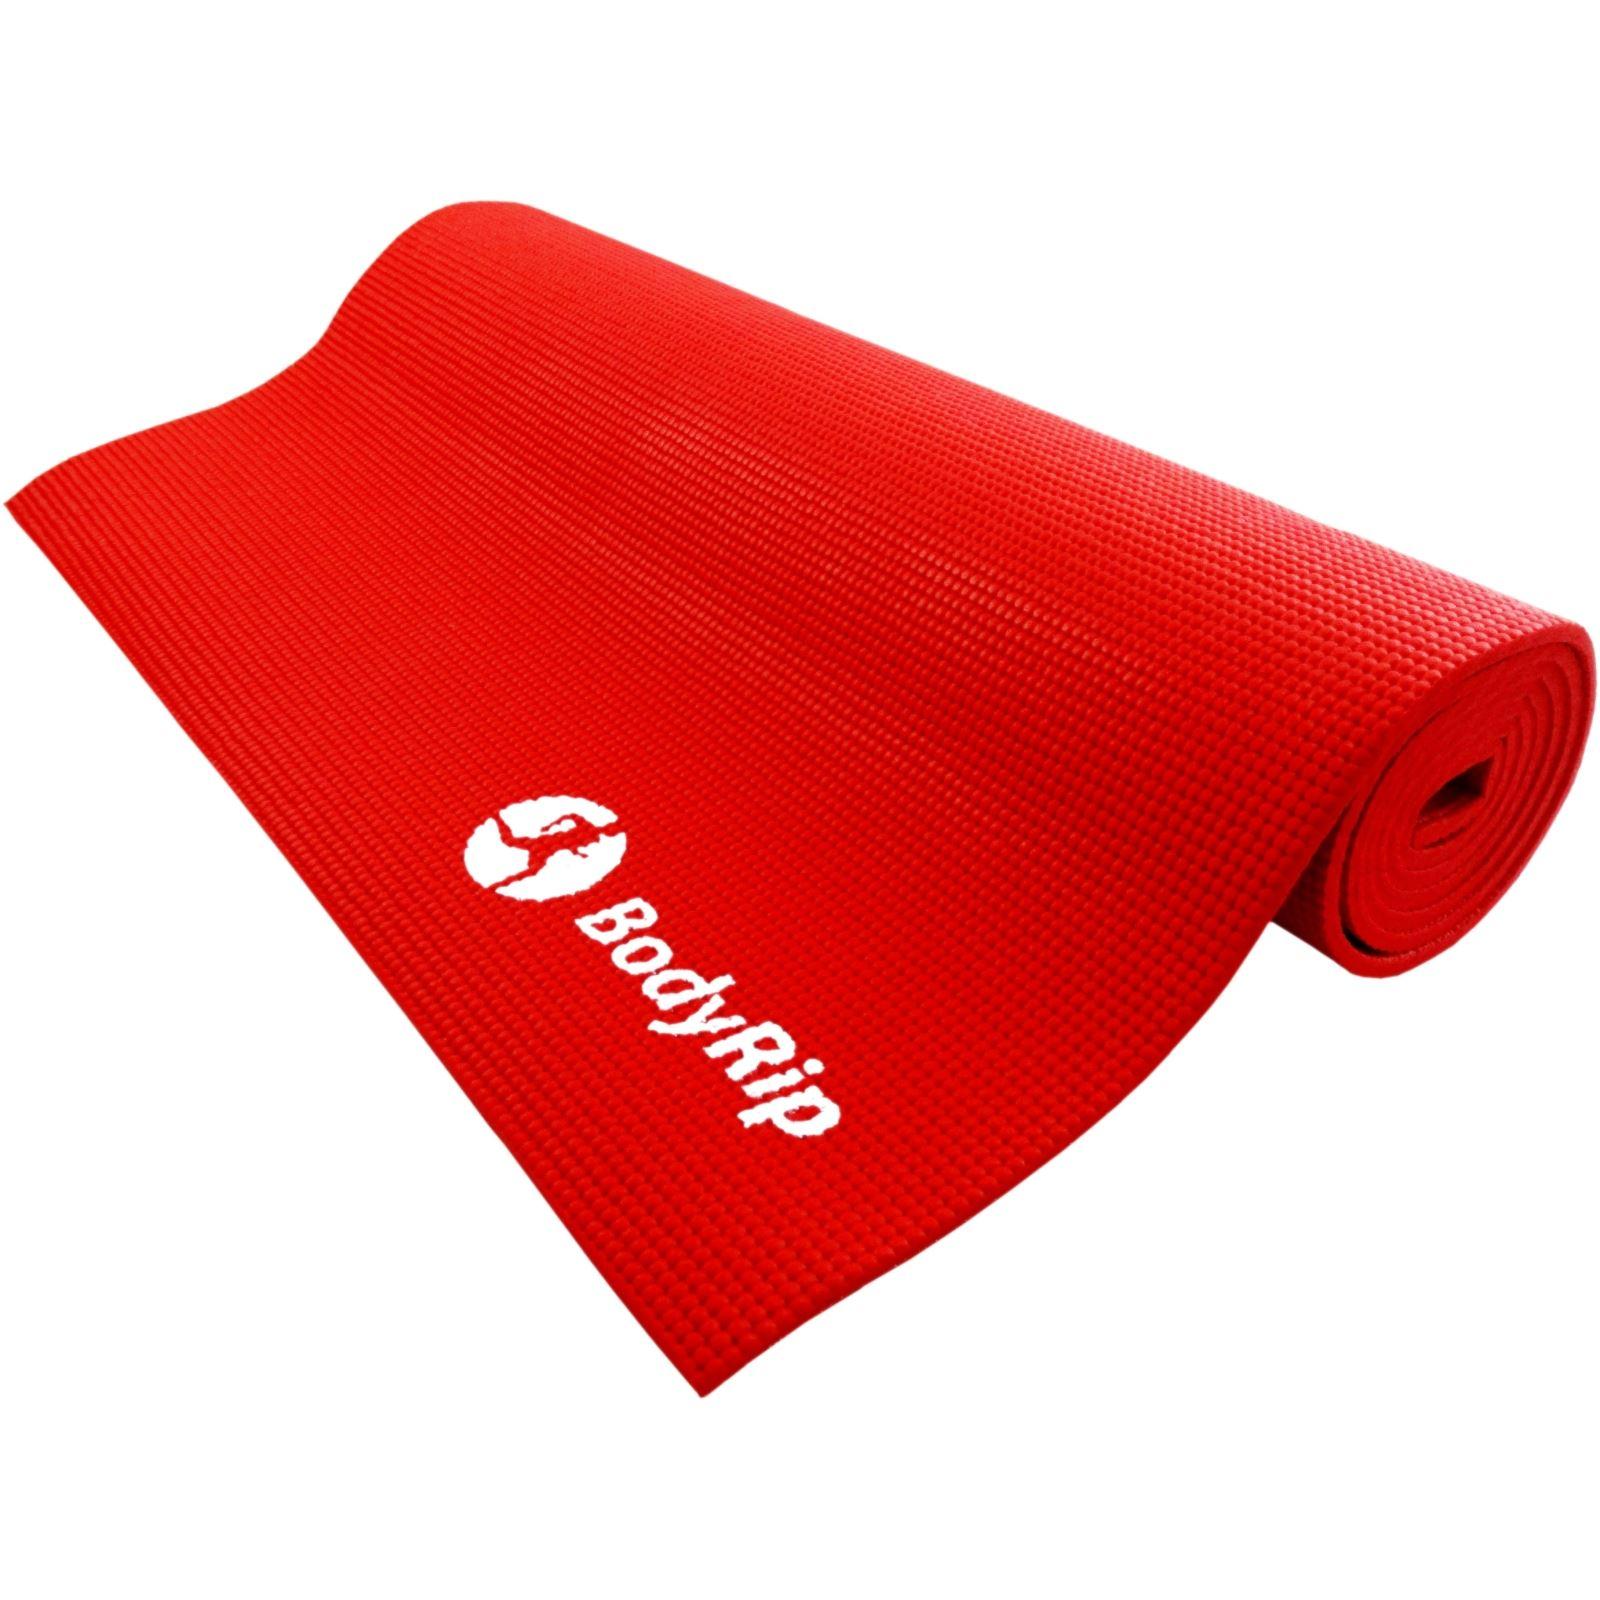 Yoga Pilates Fitness Gymnastic Mats 6mm Workout Gym